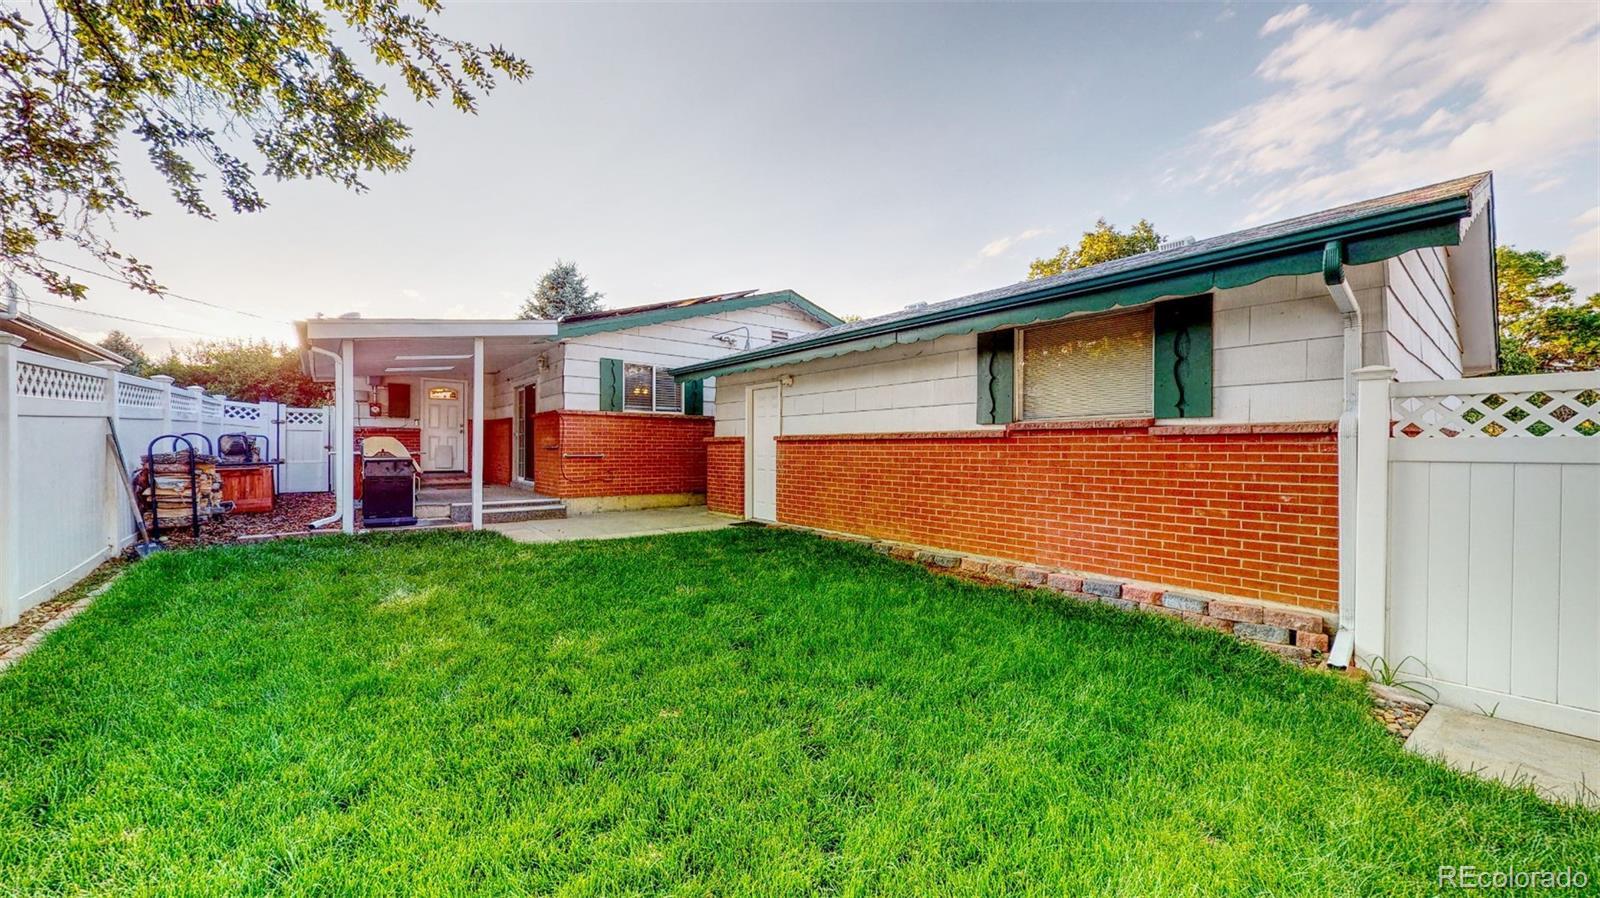 MLS# 6167151 - 5 - 1760 S Upham Street, Lakewood, CO 80232